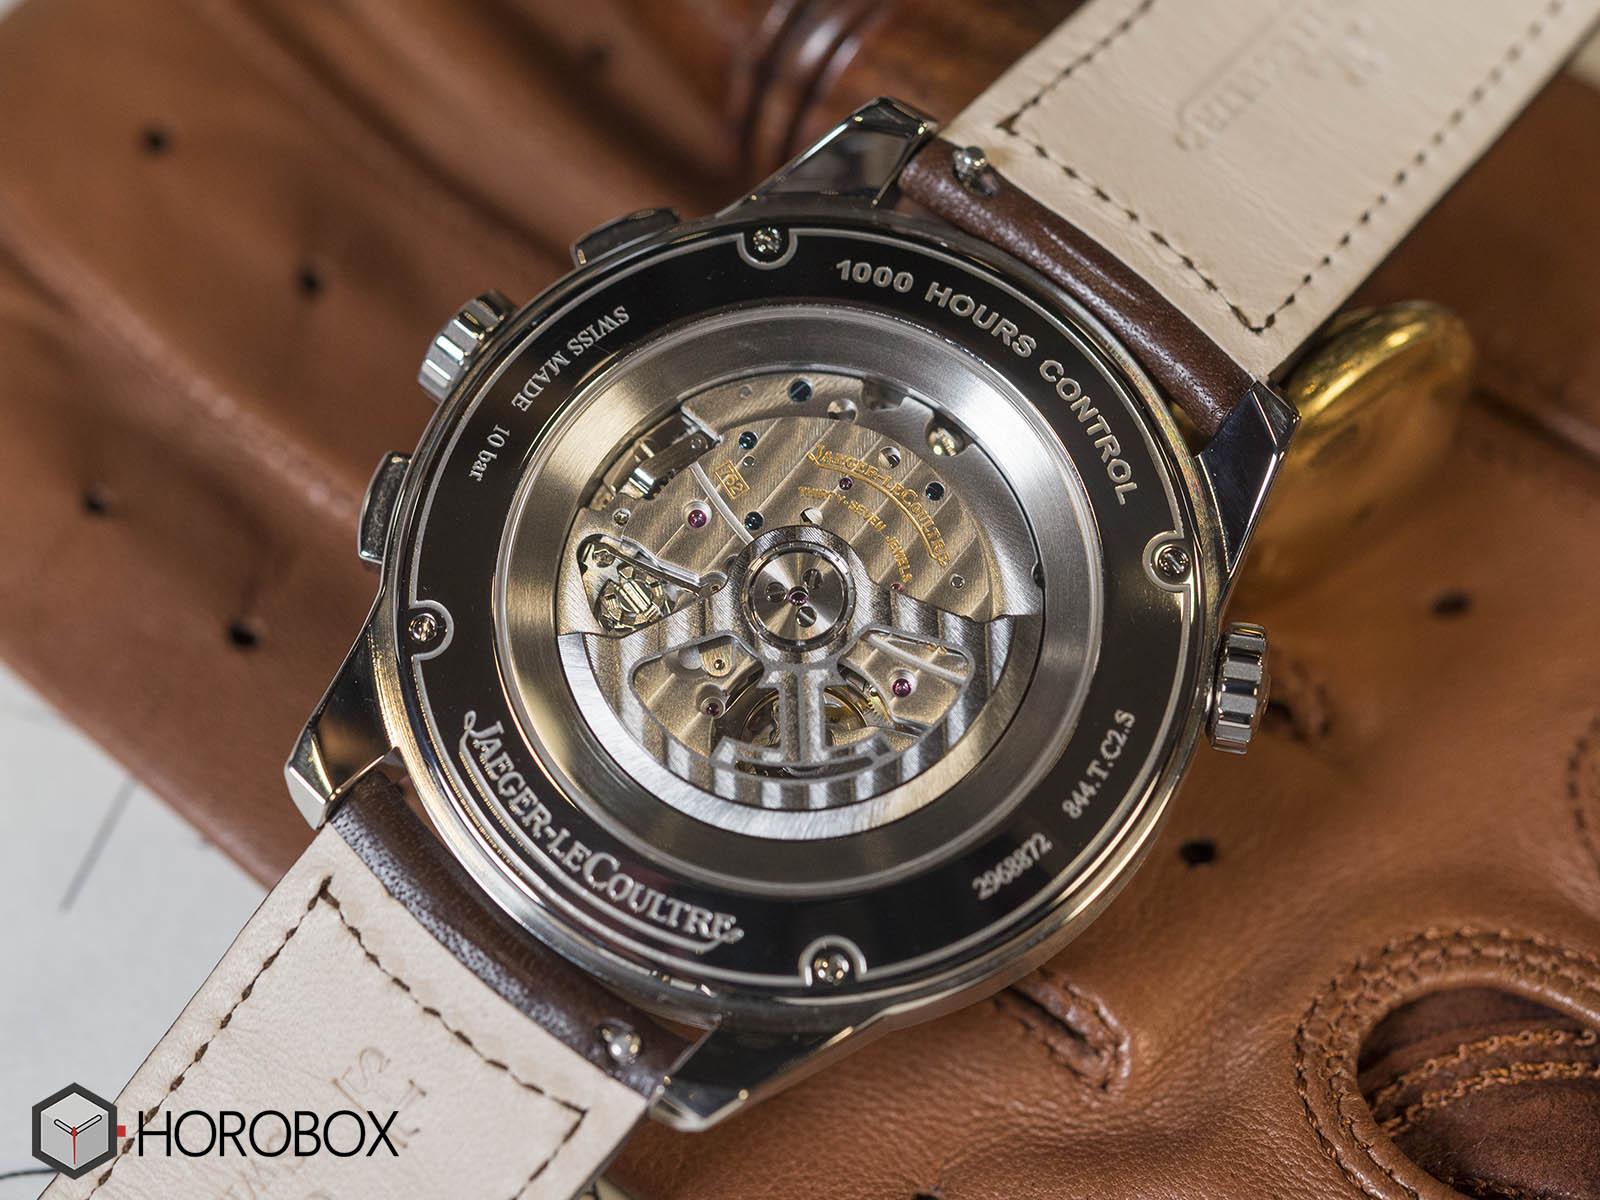 905T480-Jaeger-LeCoultre-polaris-kronograf-dünya zamanlayıcı-9.jpg